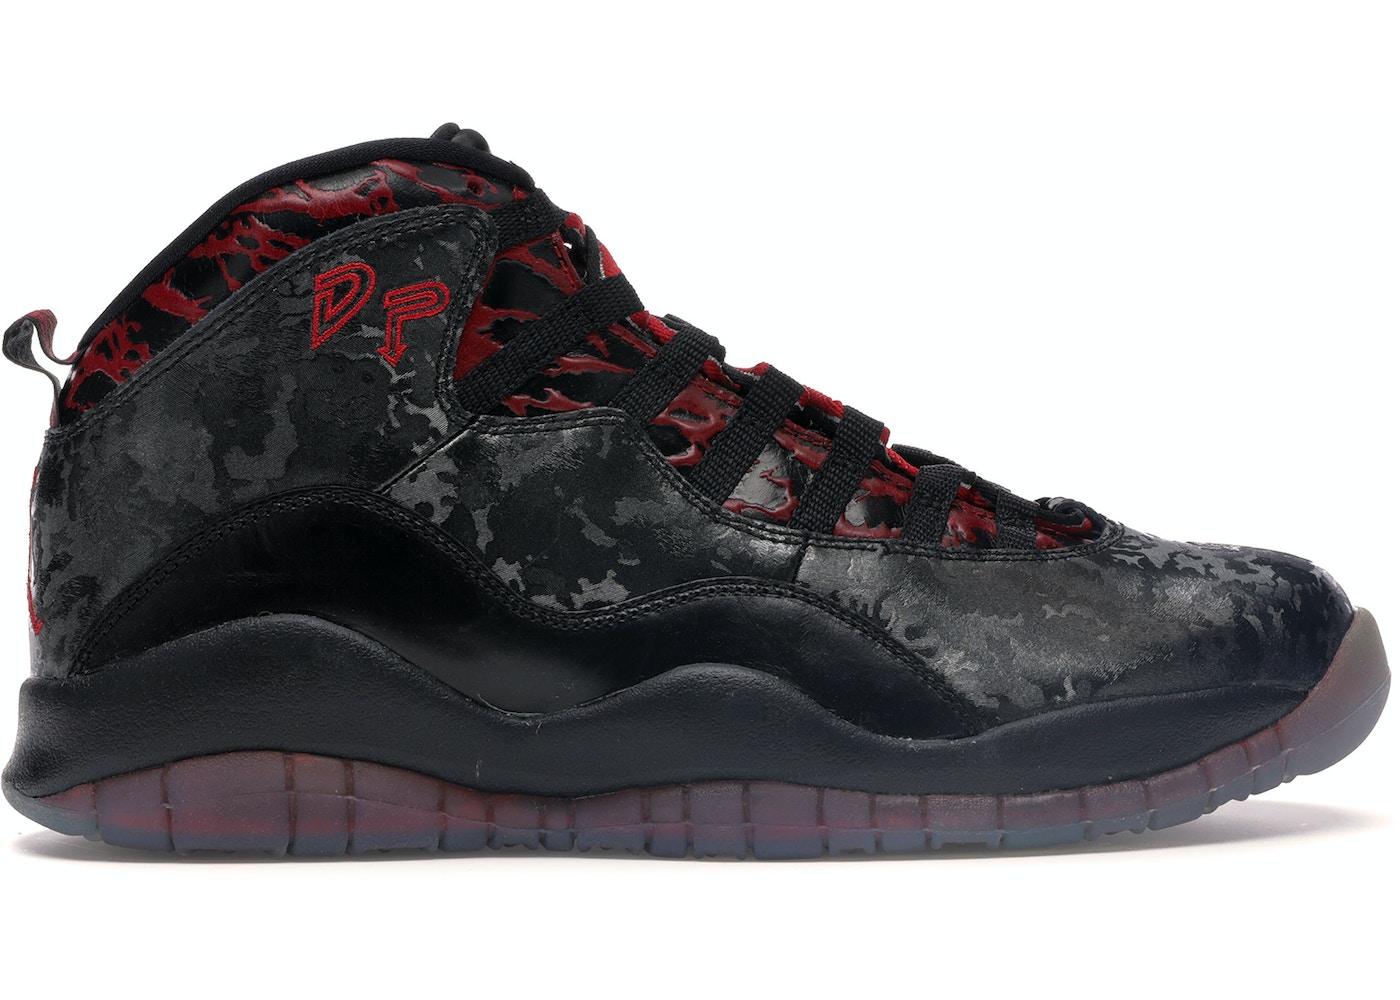 25c3758bb68 Air Jordan 10 Size 7.5 Shoes - Most Popular